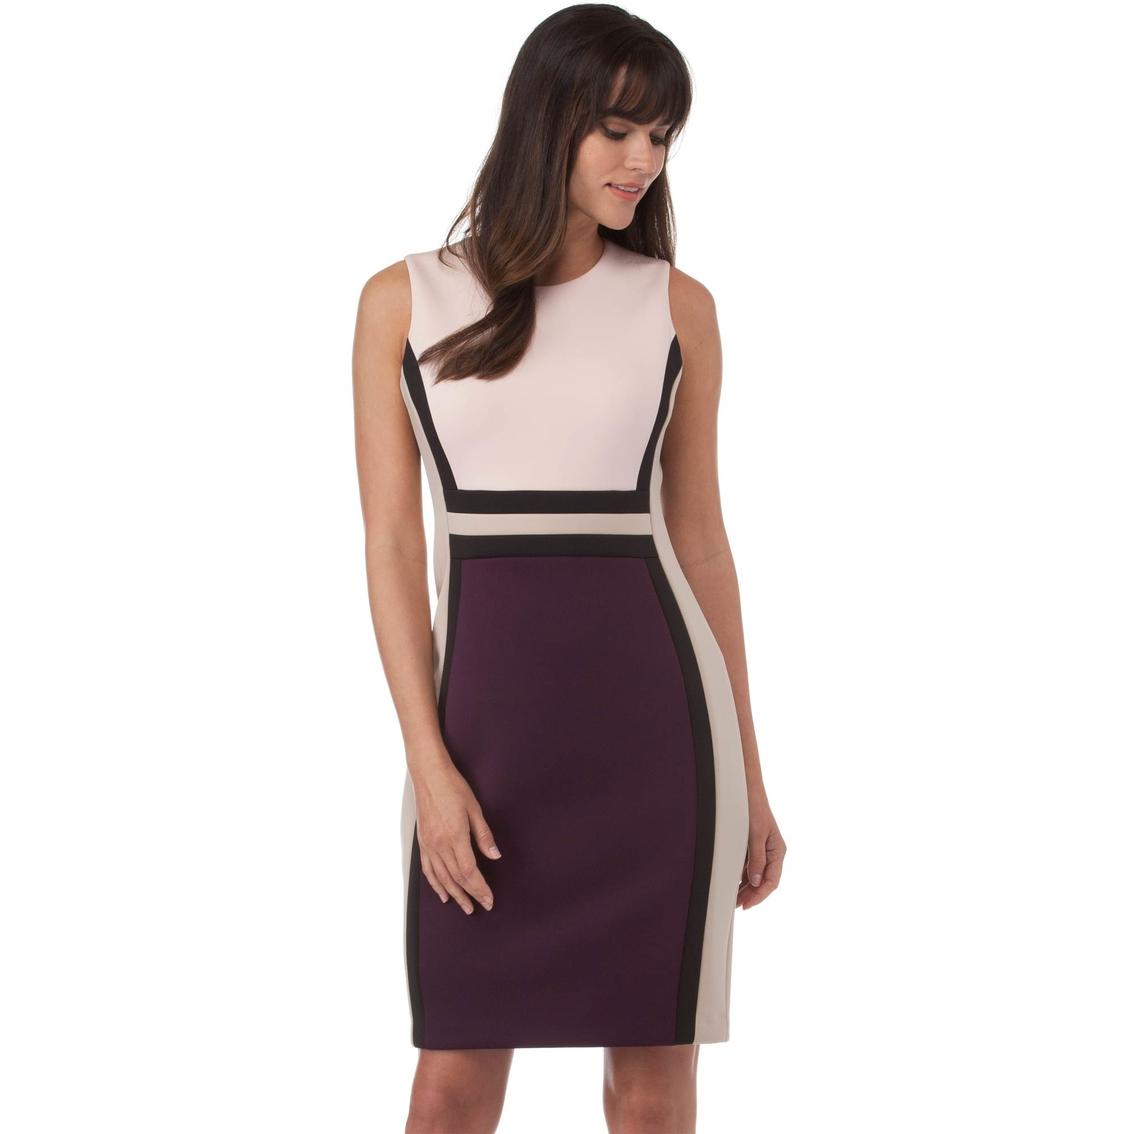 efb9c24ff331 Calvin Klein Color Block Dress